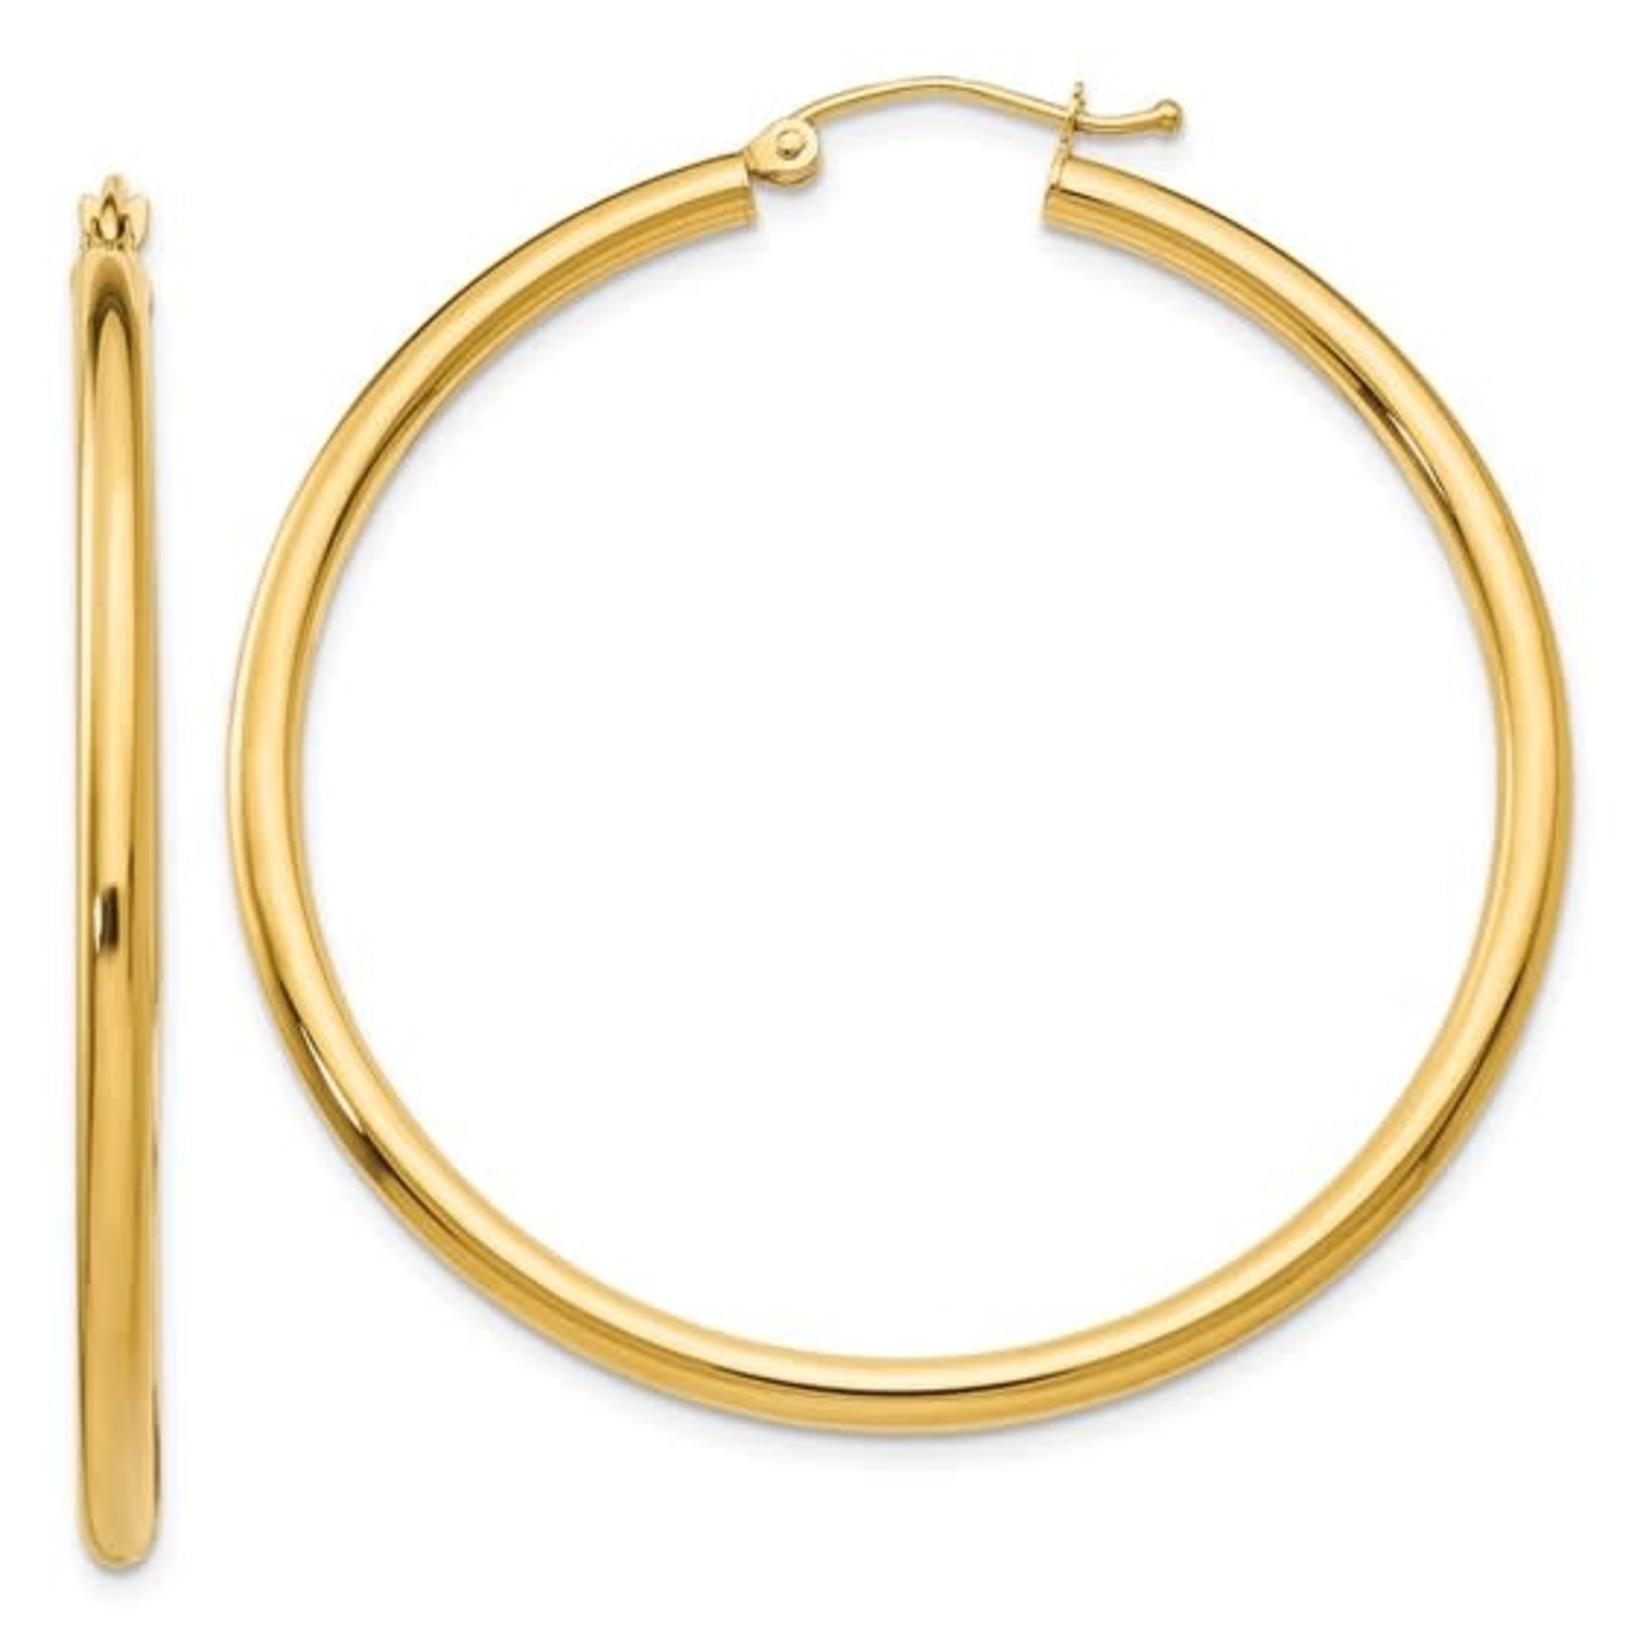 14k Polished 2.5mm Lightweight Round Hoop Earrings